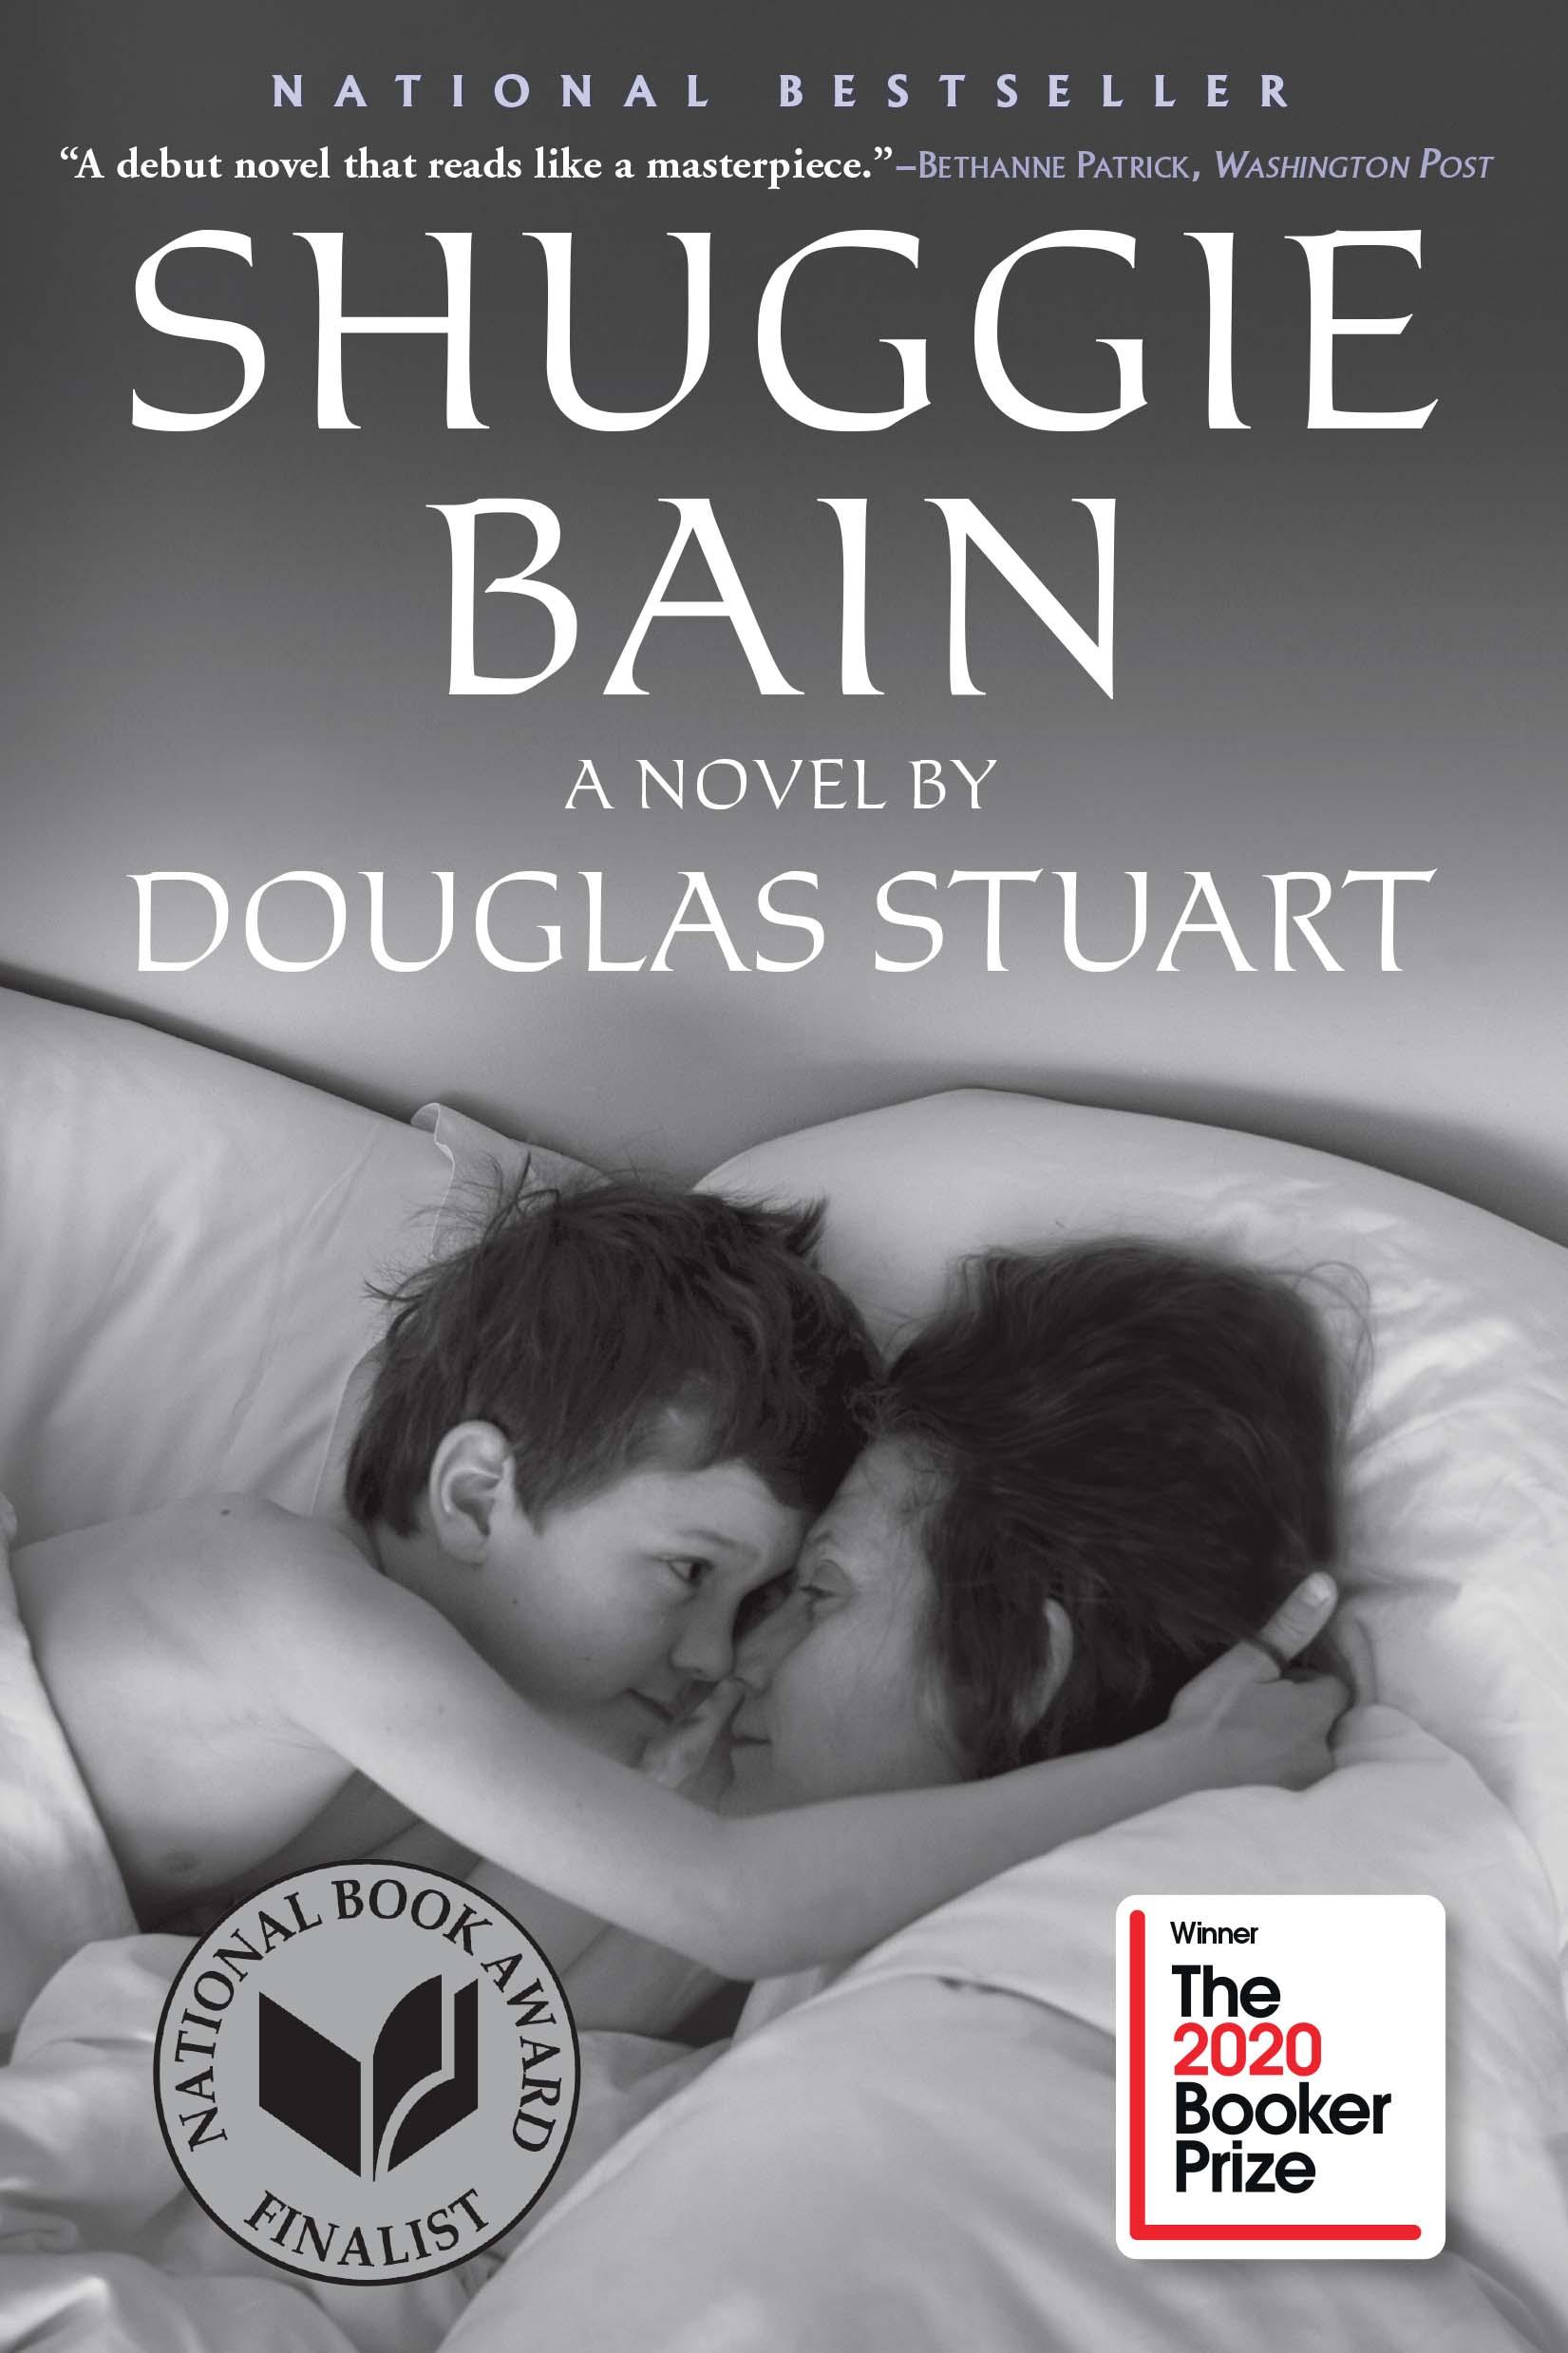 Douglas Stuart Wins Booker Prize for 'Shuggie Bain' (Grove Atlantic)